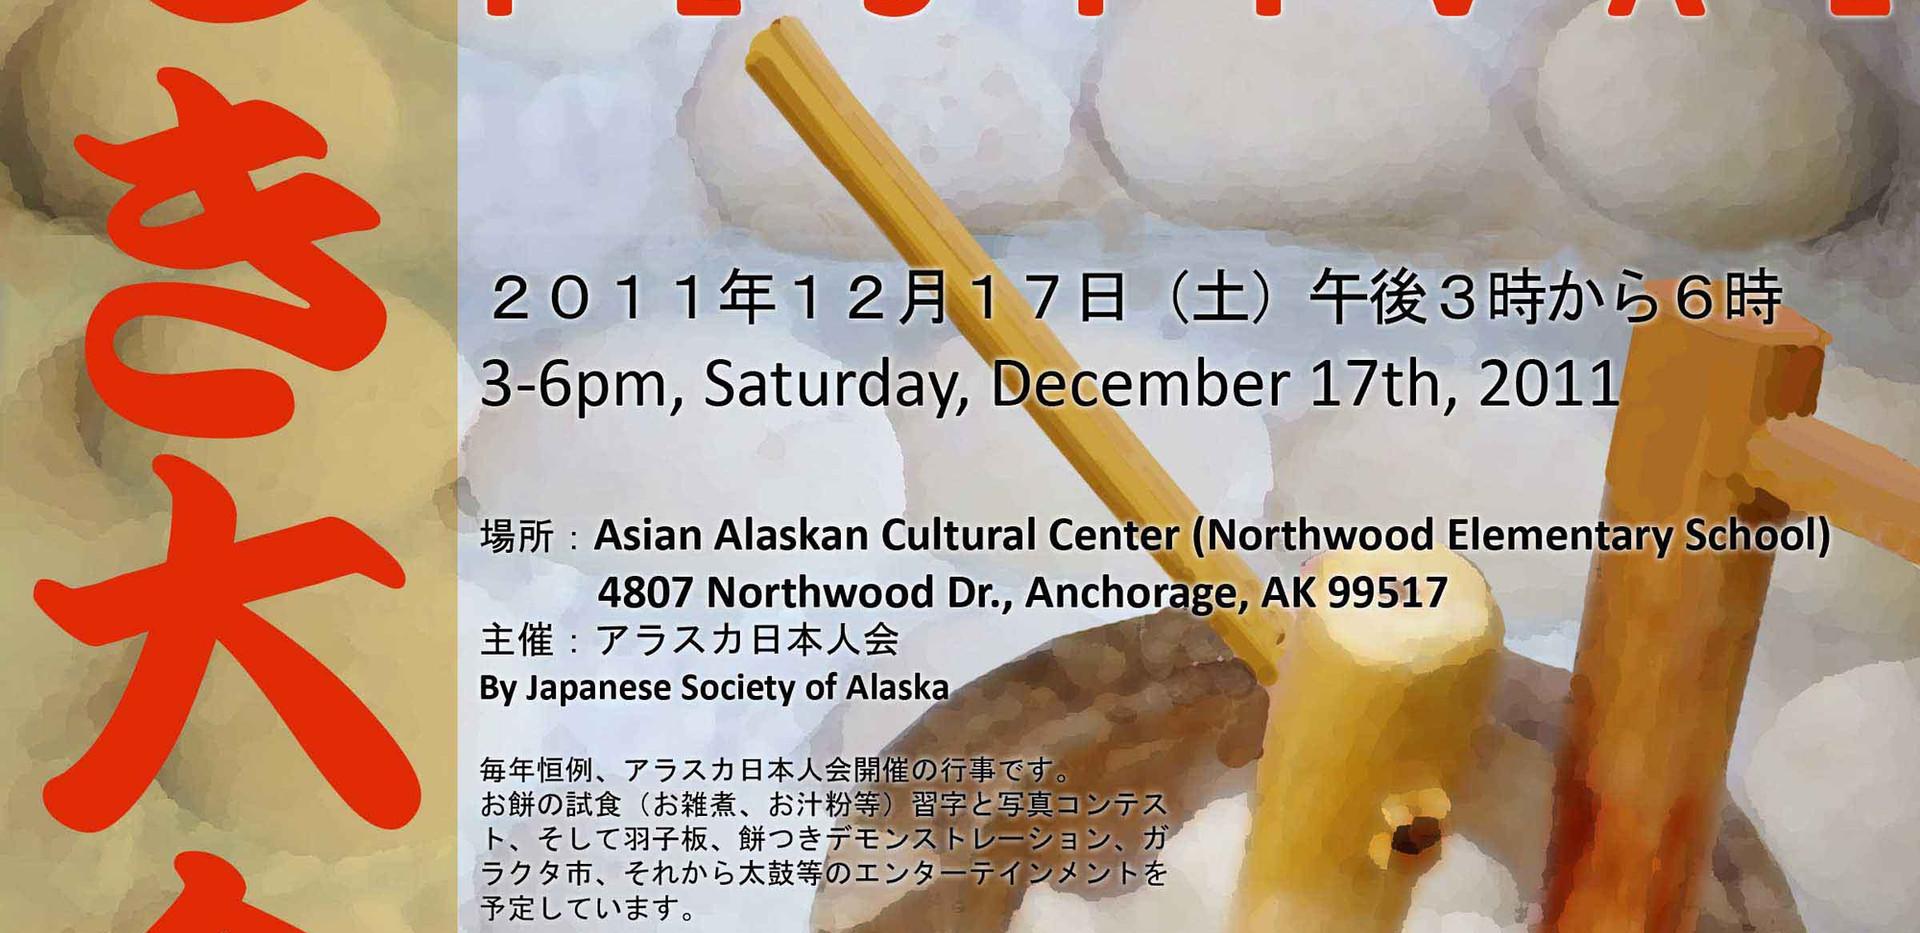 Mochitsuki Poster.jpg